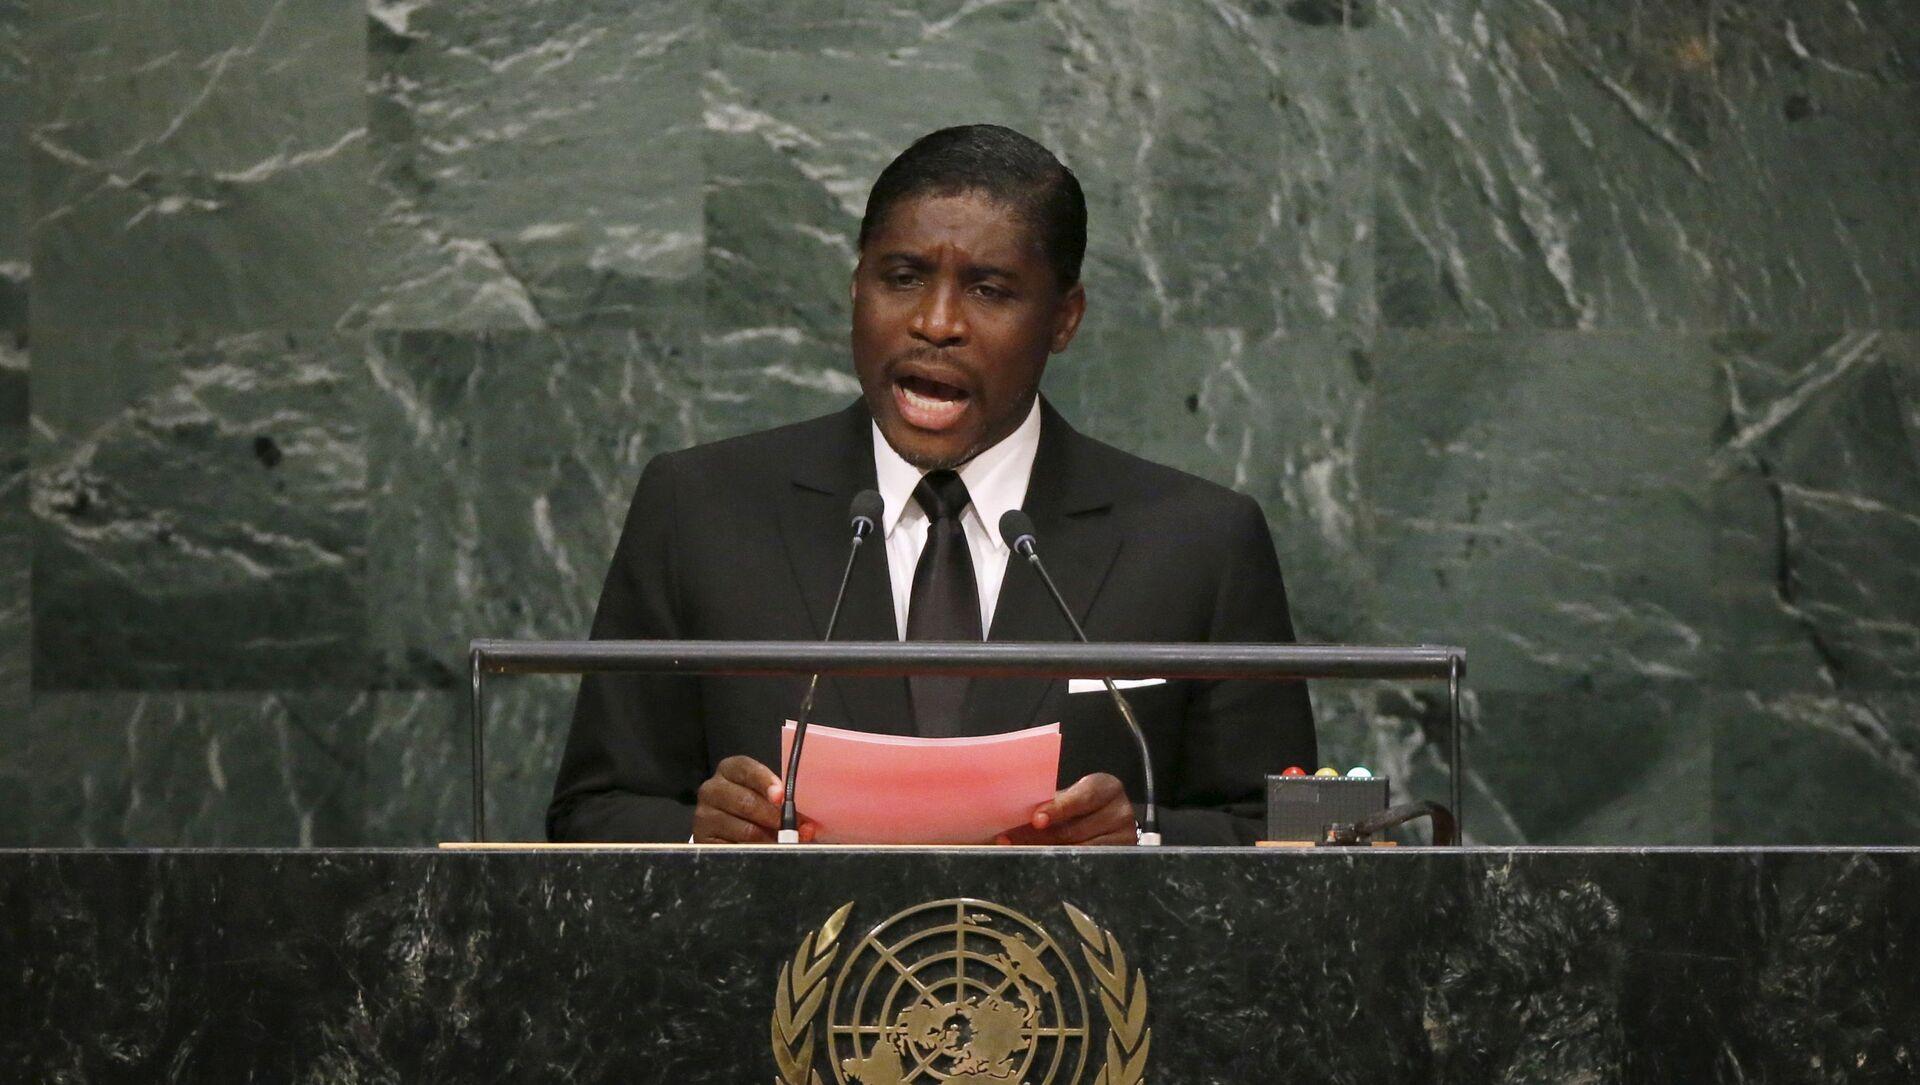 Equatorial Guinea's Second Vice-President Teodoro Nguema Obiang Mangue addresses the UN - Sputnik International, 1920, 26.07.2021